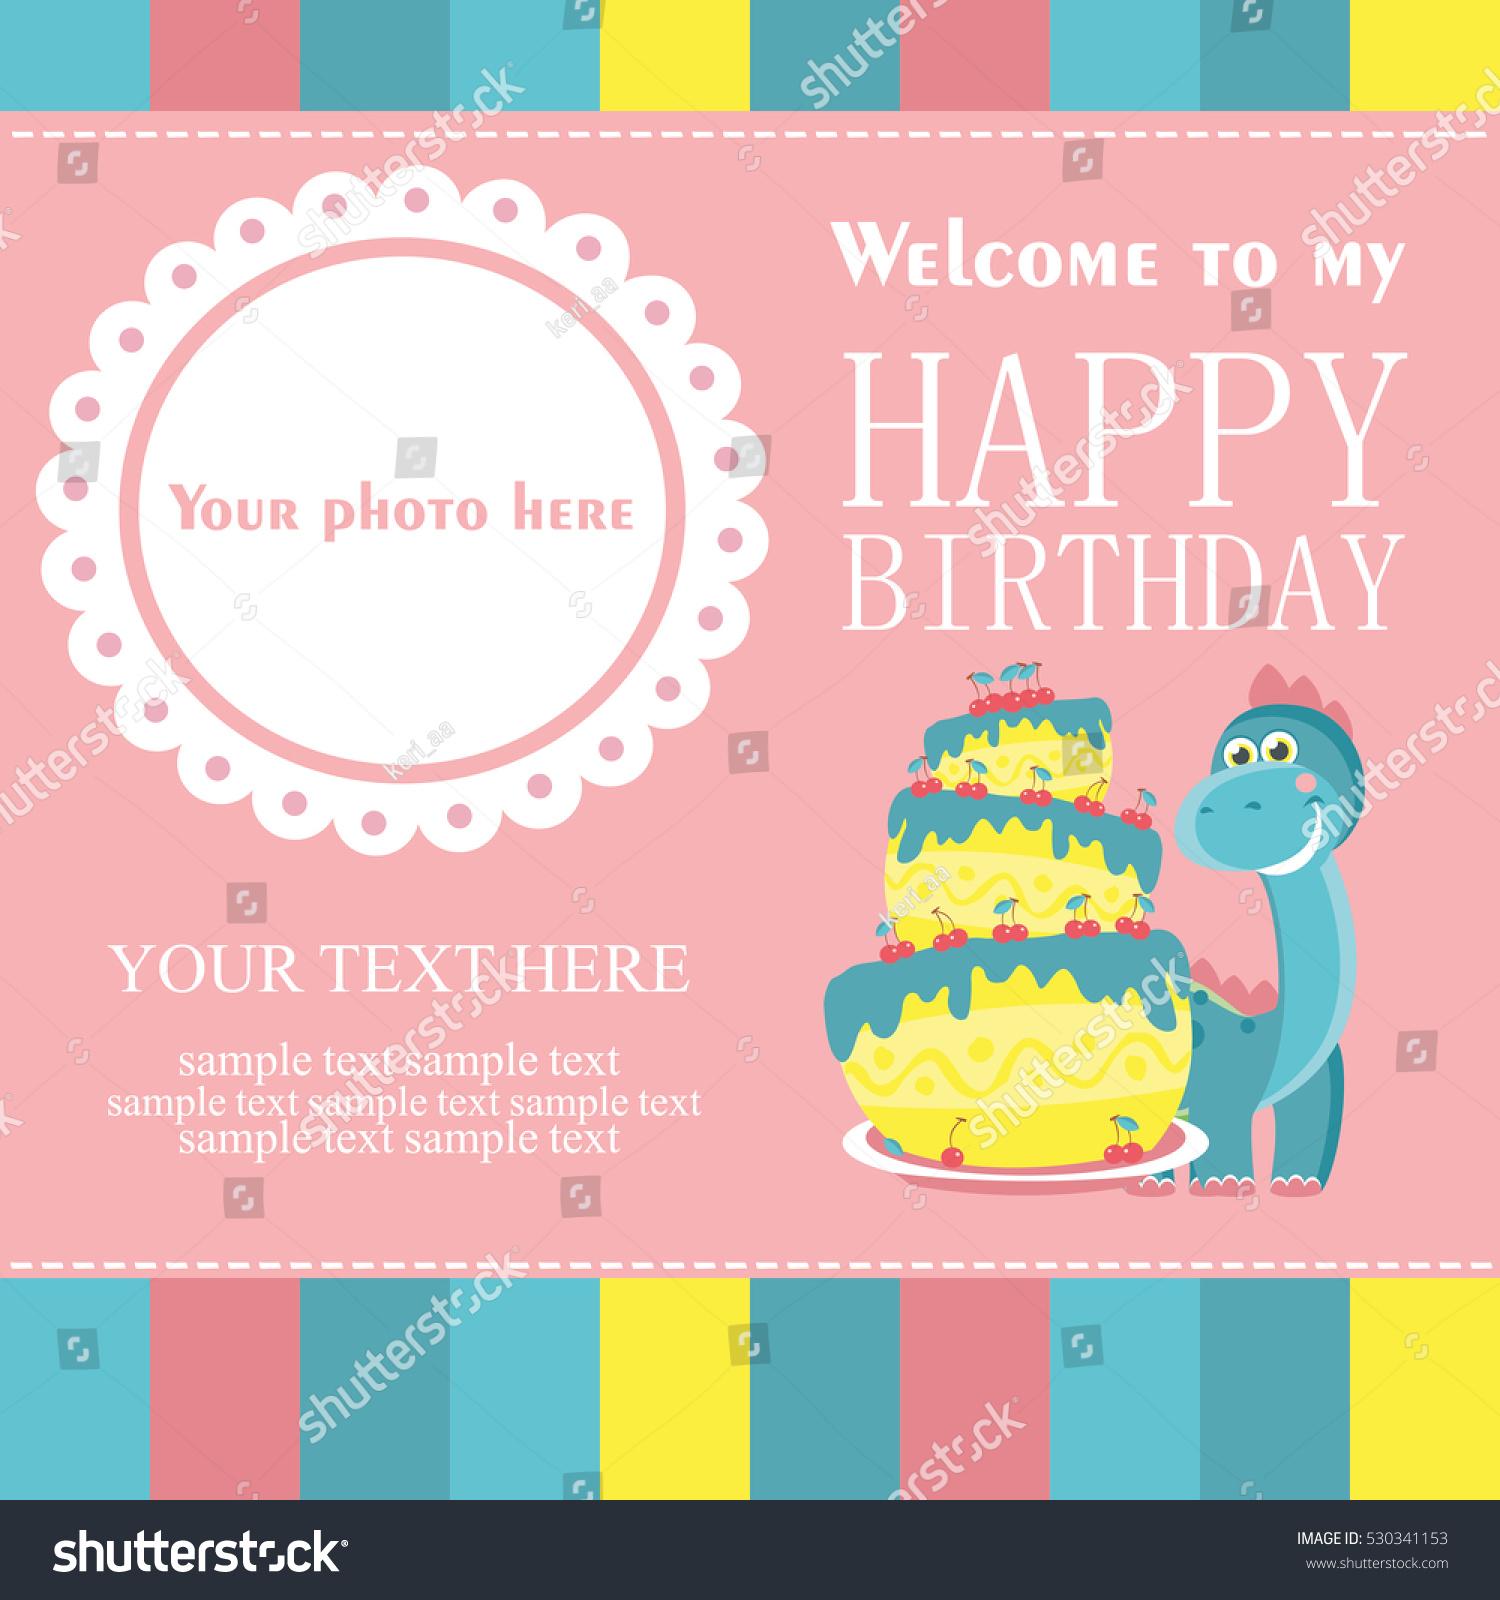 Sample of birthday card pasoevolist sample of birthday card bookmarktalkfo Images